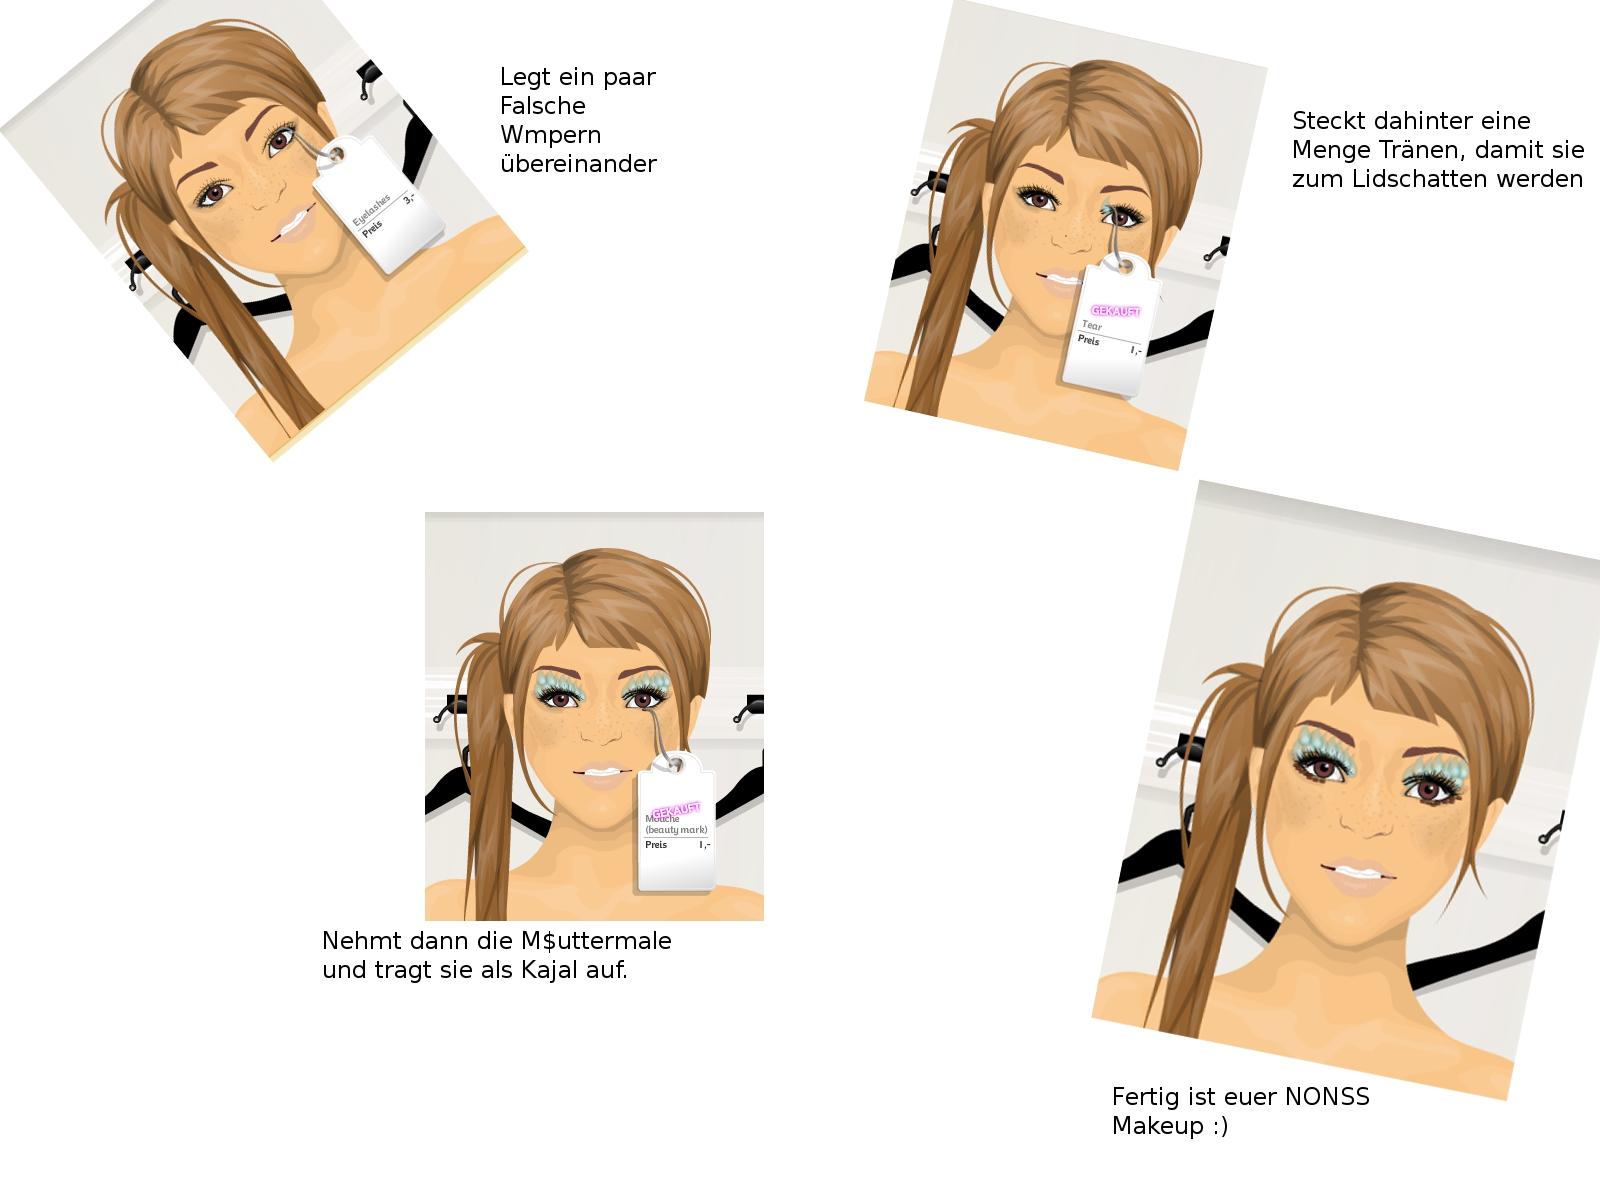 http://4.bp.blogspot.com/_ZlG-GoMFjyQ/TEVGpbynDXI/AAAAAAAAB34/DgbGeWfnkB8/s1600/Makeup3-mag2.jpg